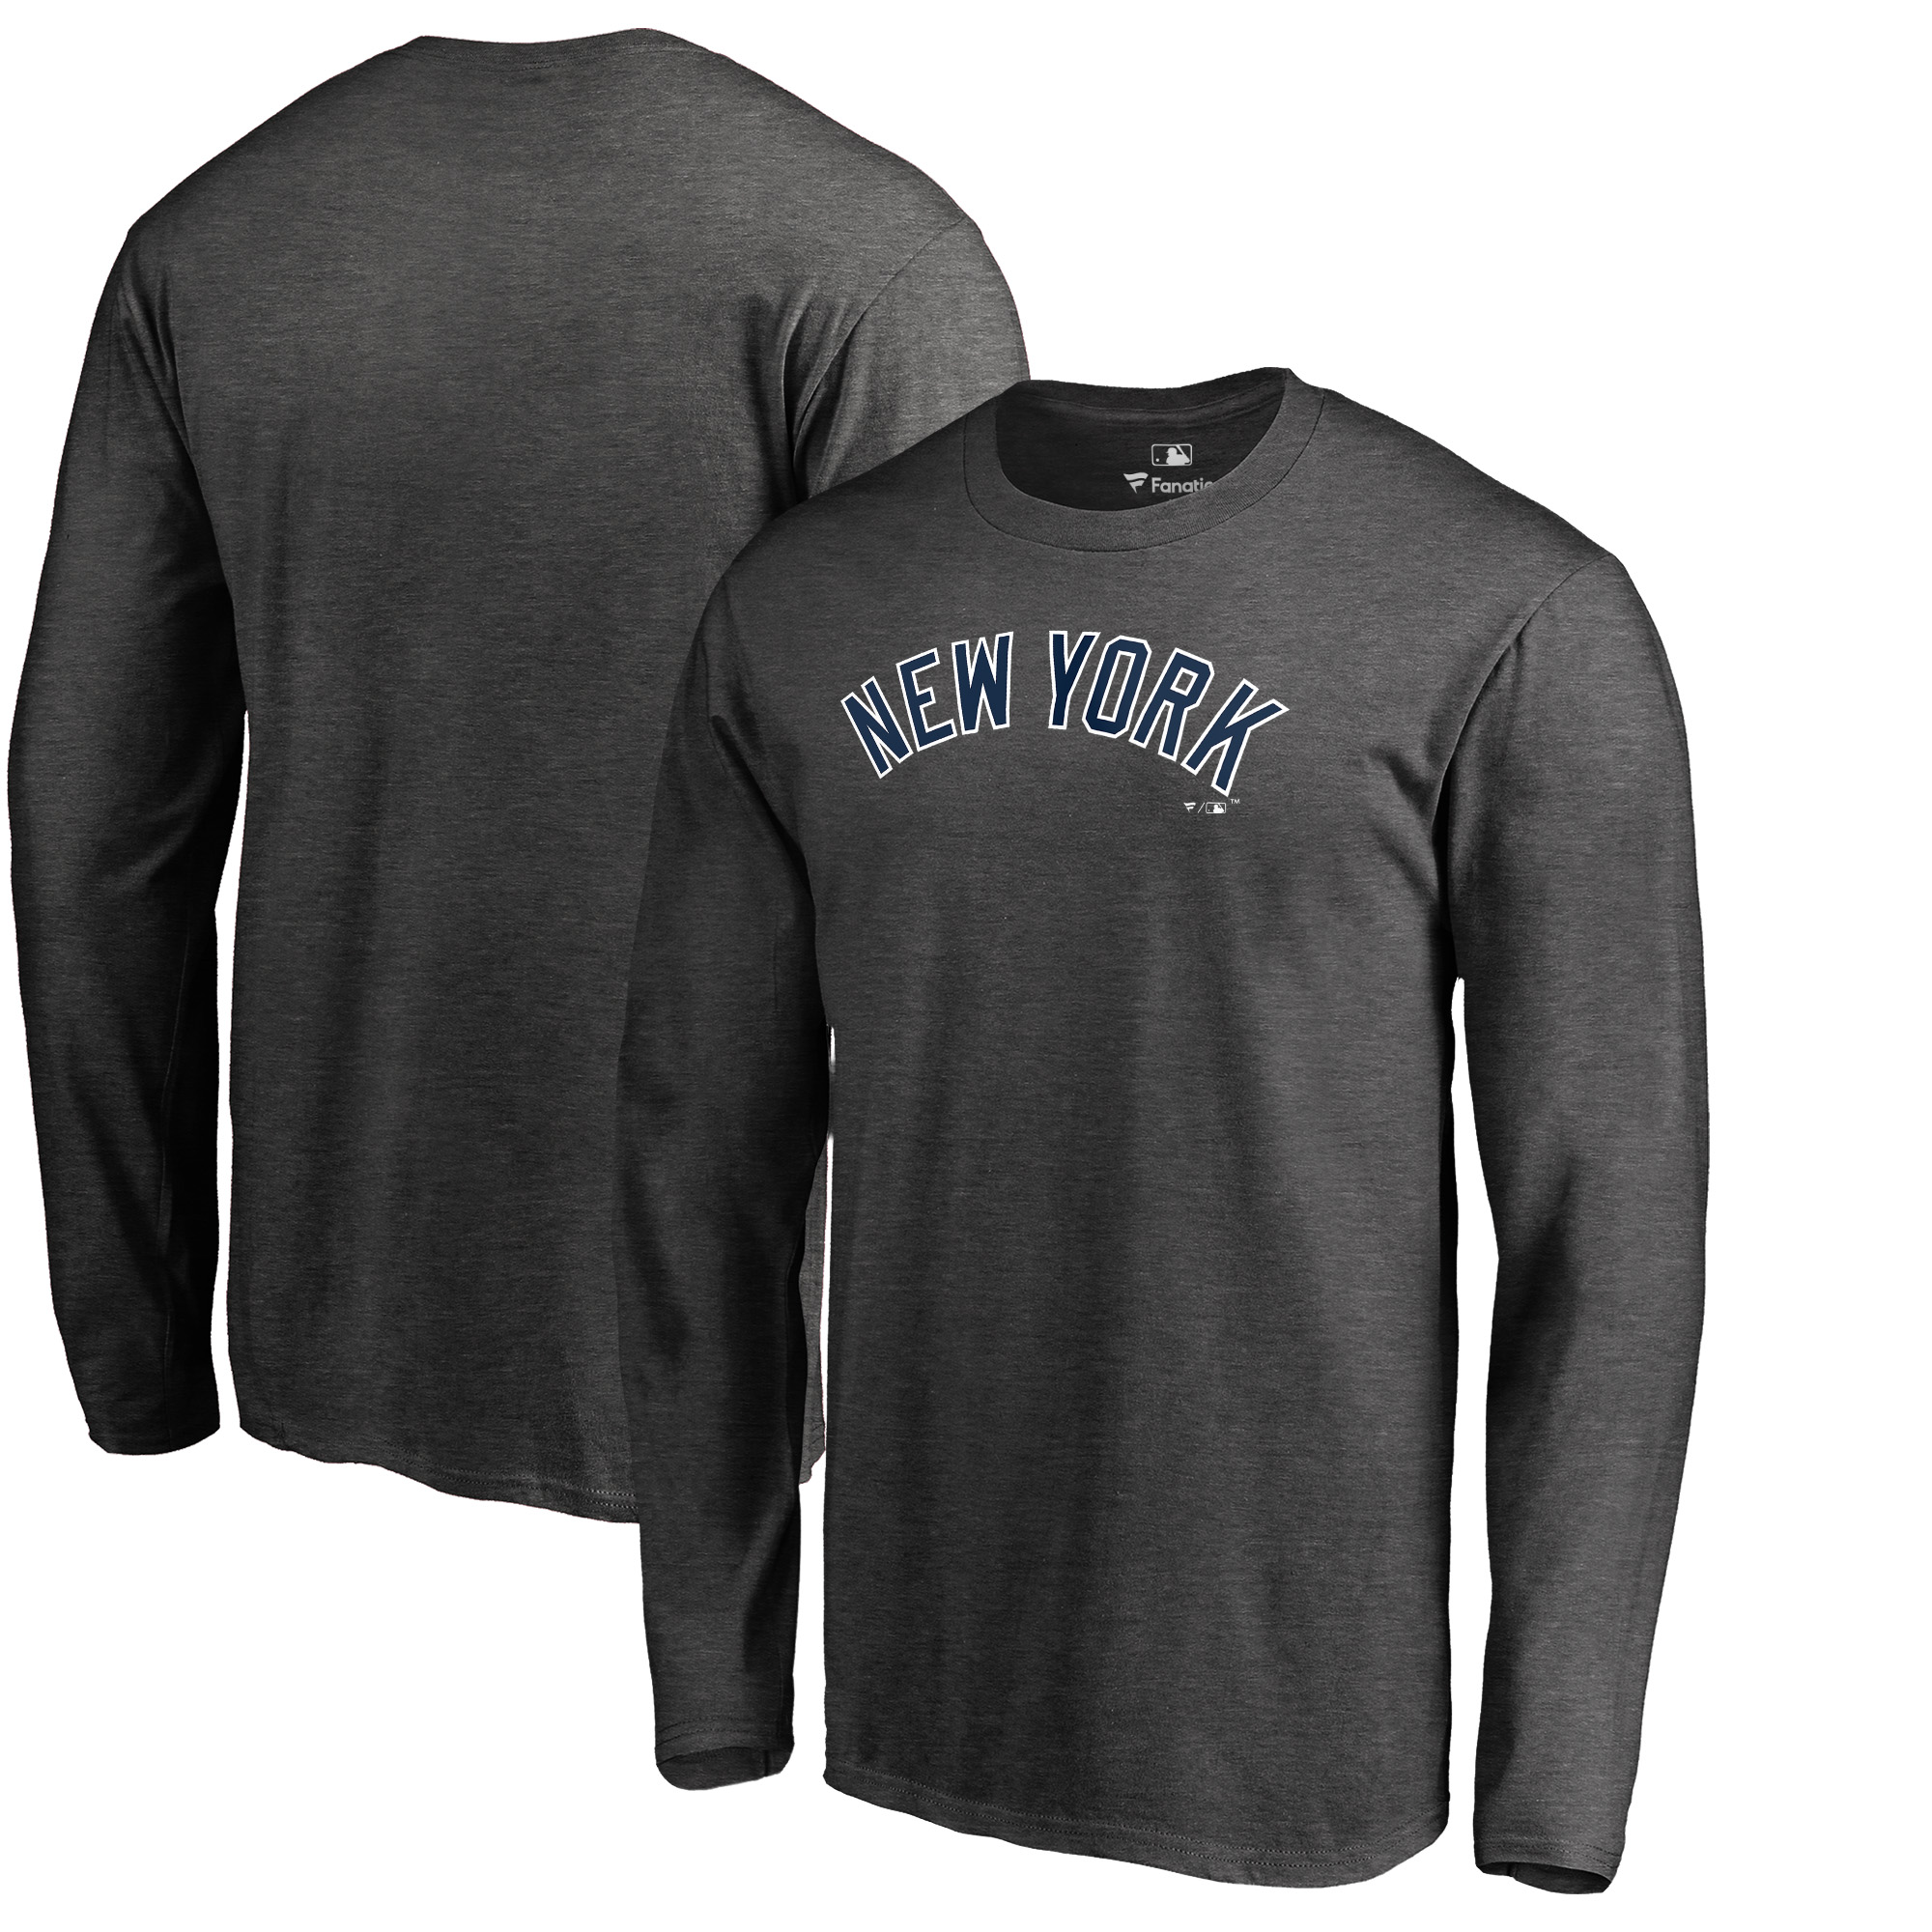 New York Yankees Fanatics Branded Big & Tall Team Wordmark Long Sleeve T-Shirt - Heathered Charcoal